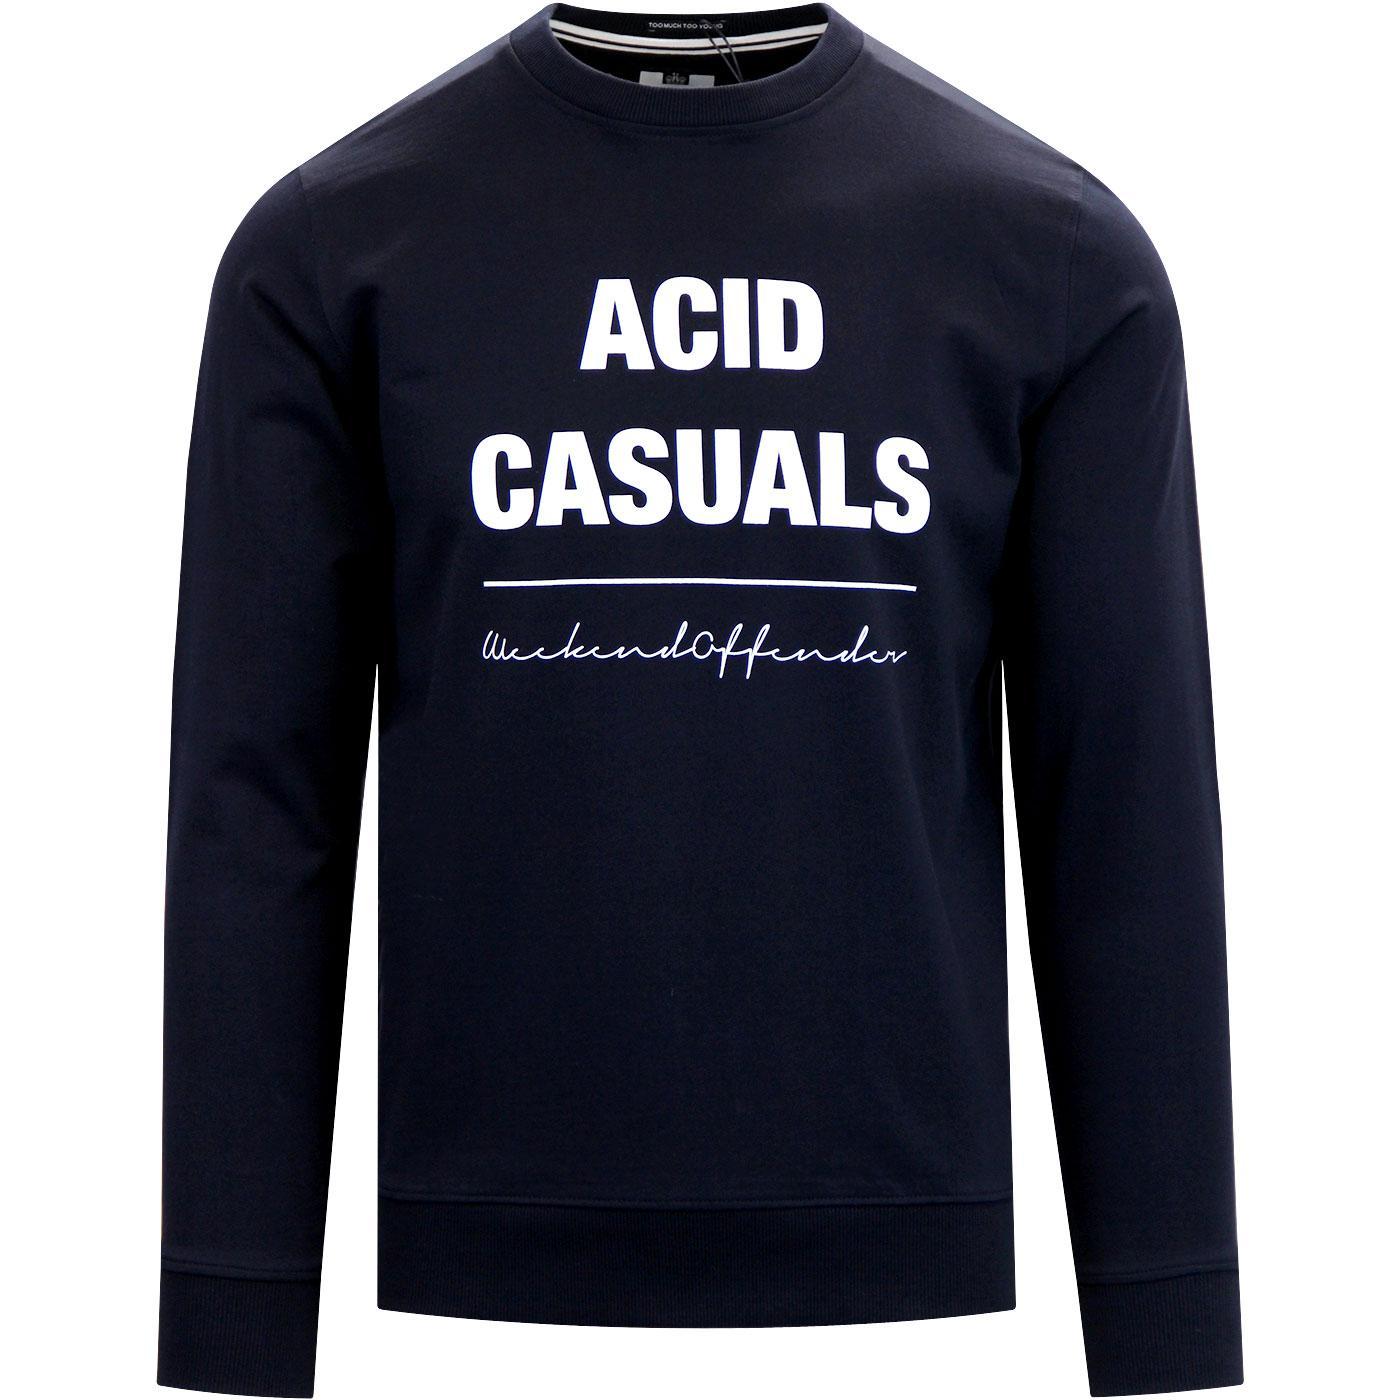 Acid Casual WEEKEND OFFENDER Retro Print Sweater